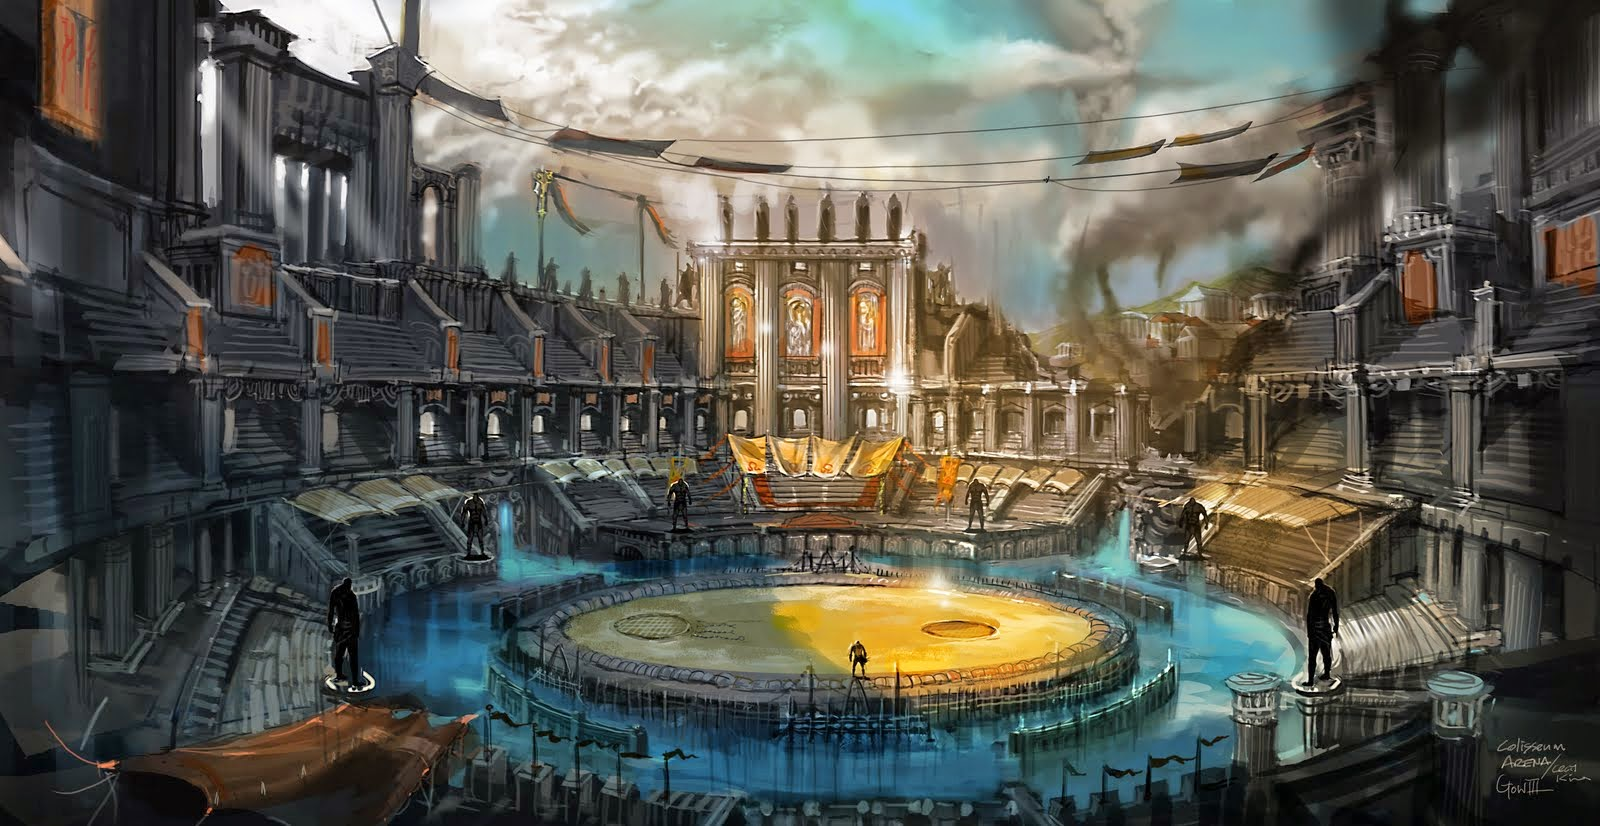 The Grand Finale [Rita vs. Grantus] Coliseum%2Barena_ckim